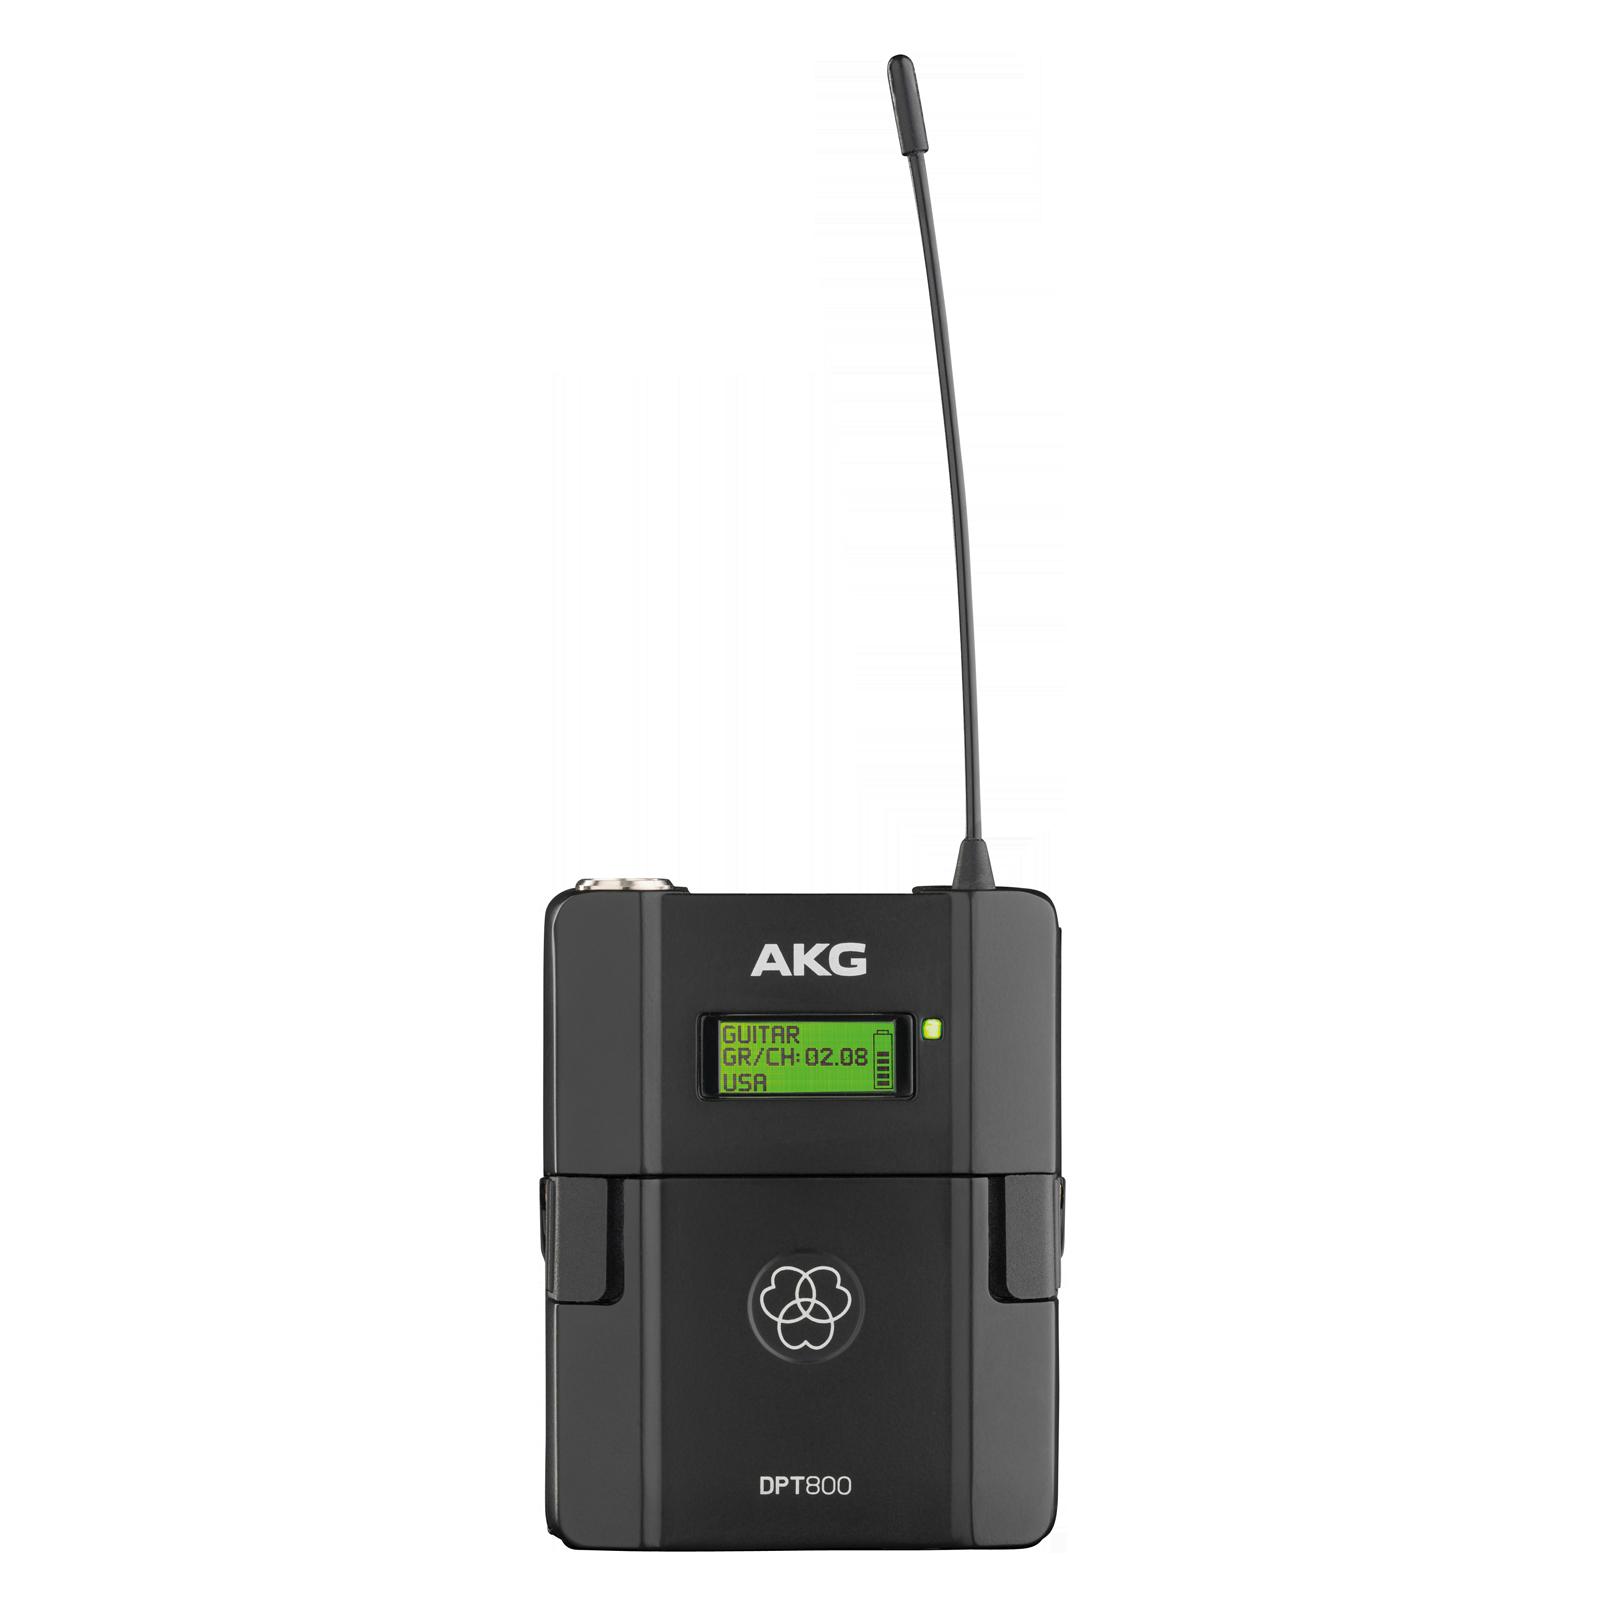 DPT800 Band1 50mW - Black - Reference digital wireless body pack transmitter - Hero